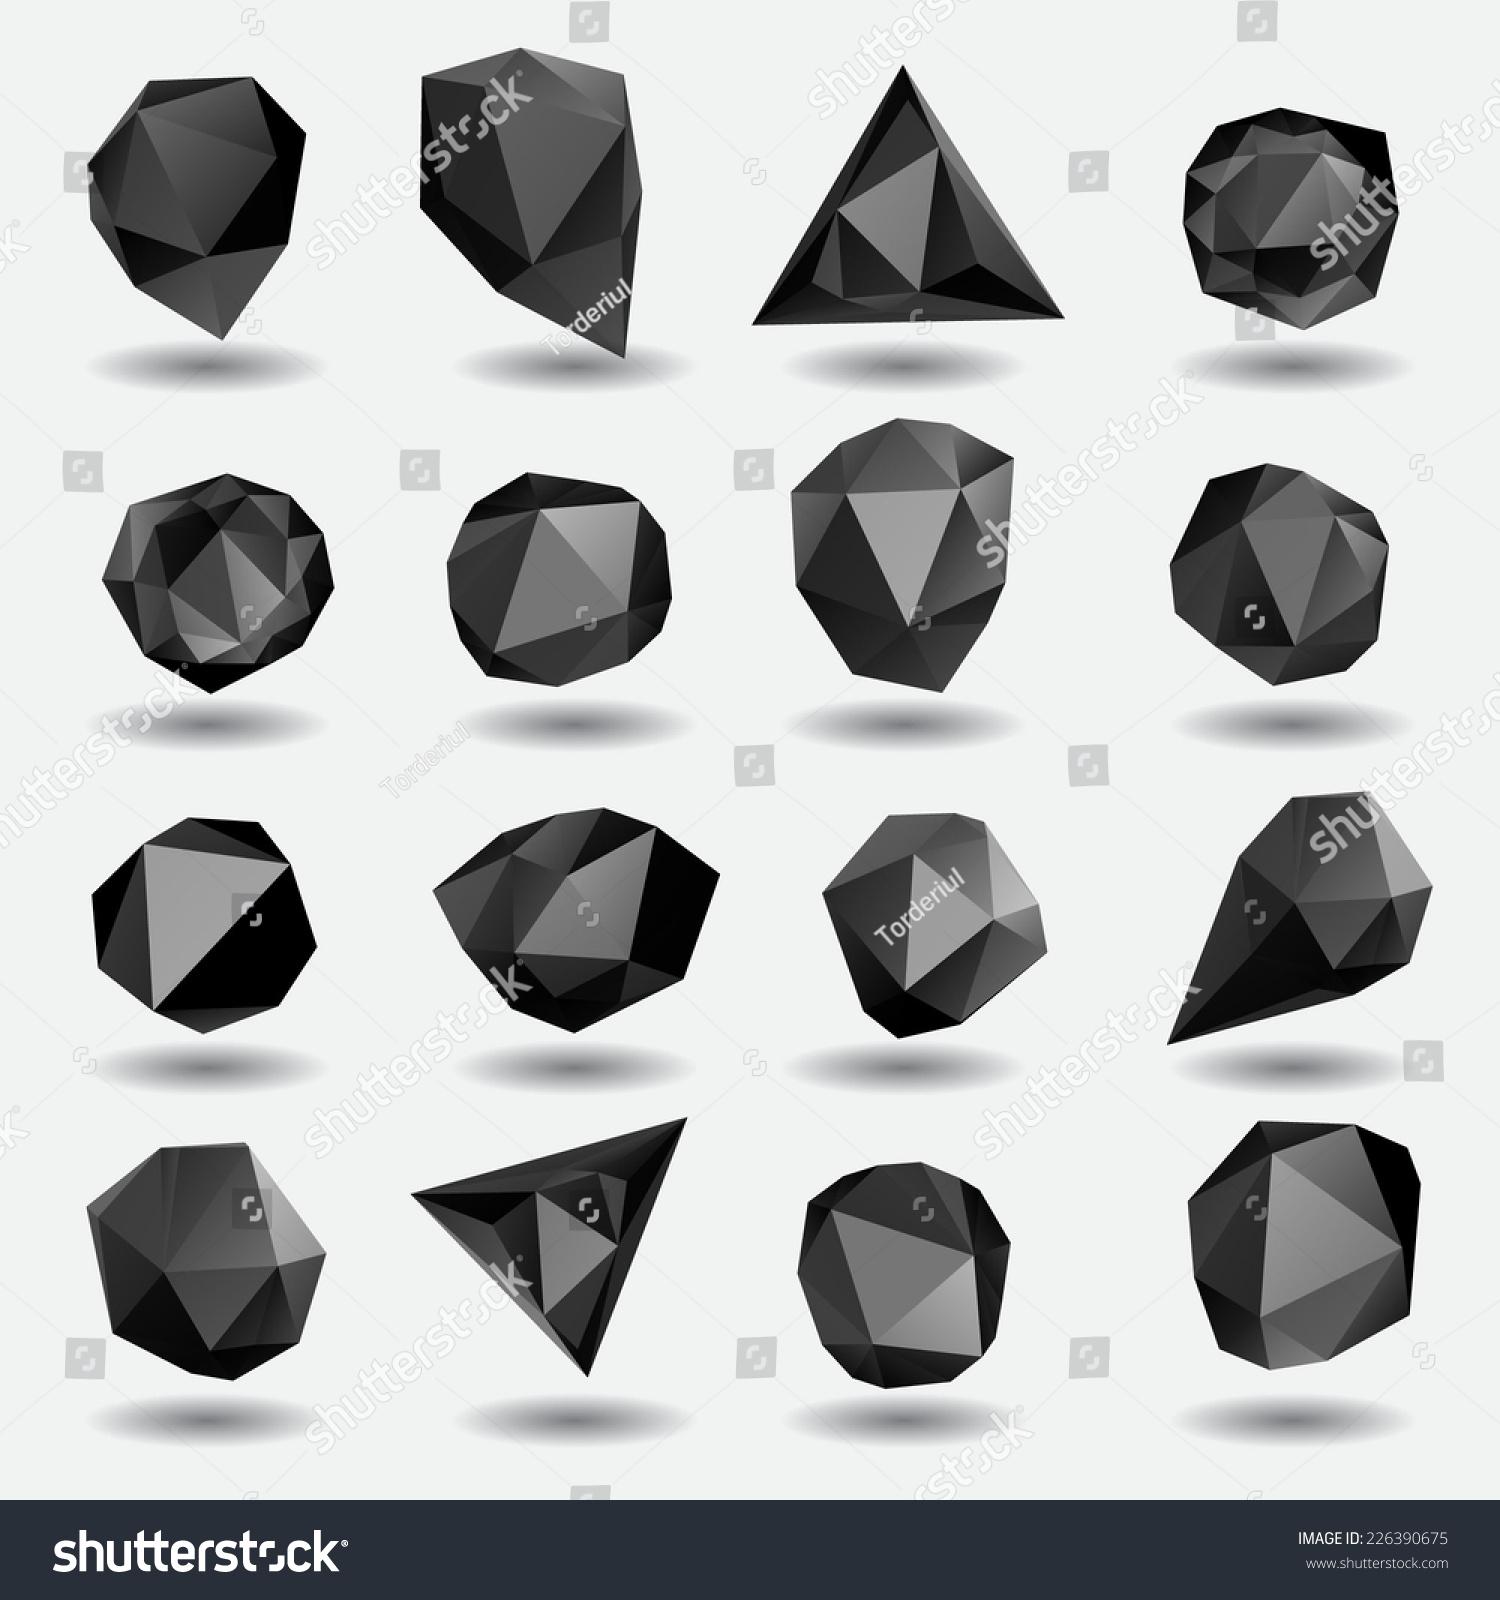 Black Diamond Polygon Triangle Stone 3d Stock Vector 226390675 ...